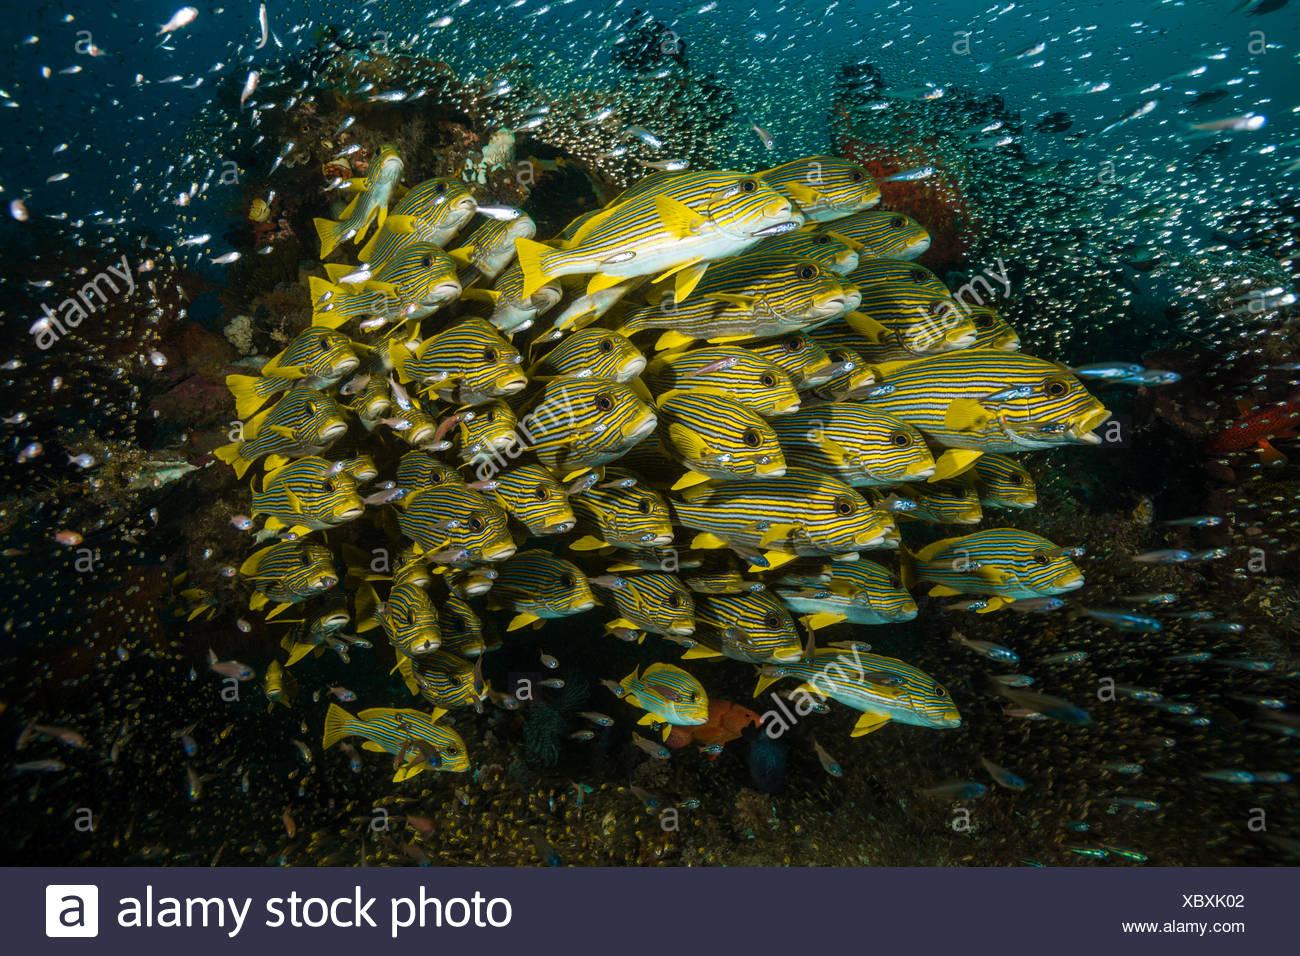 Banc de gaterins, ruban jaune Plectorhinchus polytaenia, Raja Ampat, Papouasie occidentale, en Indonésie Photo Stock